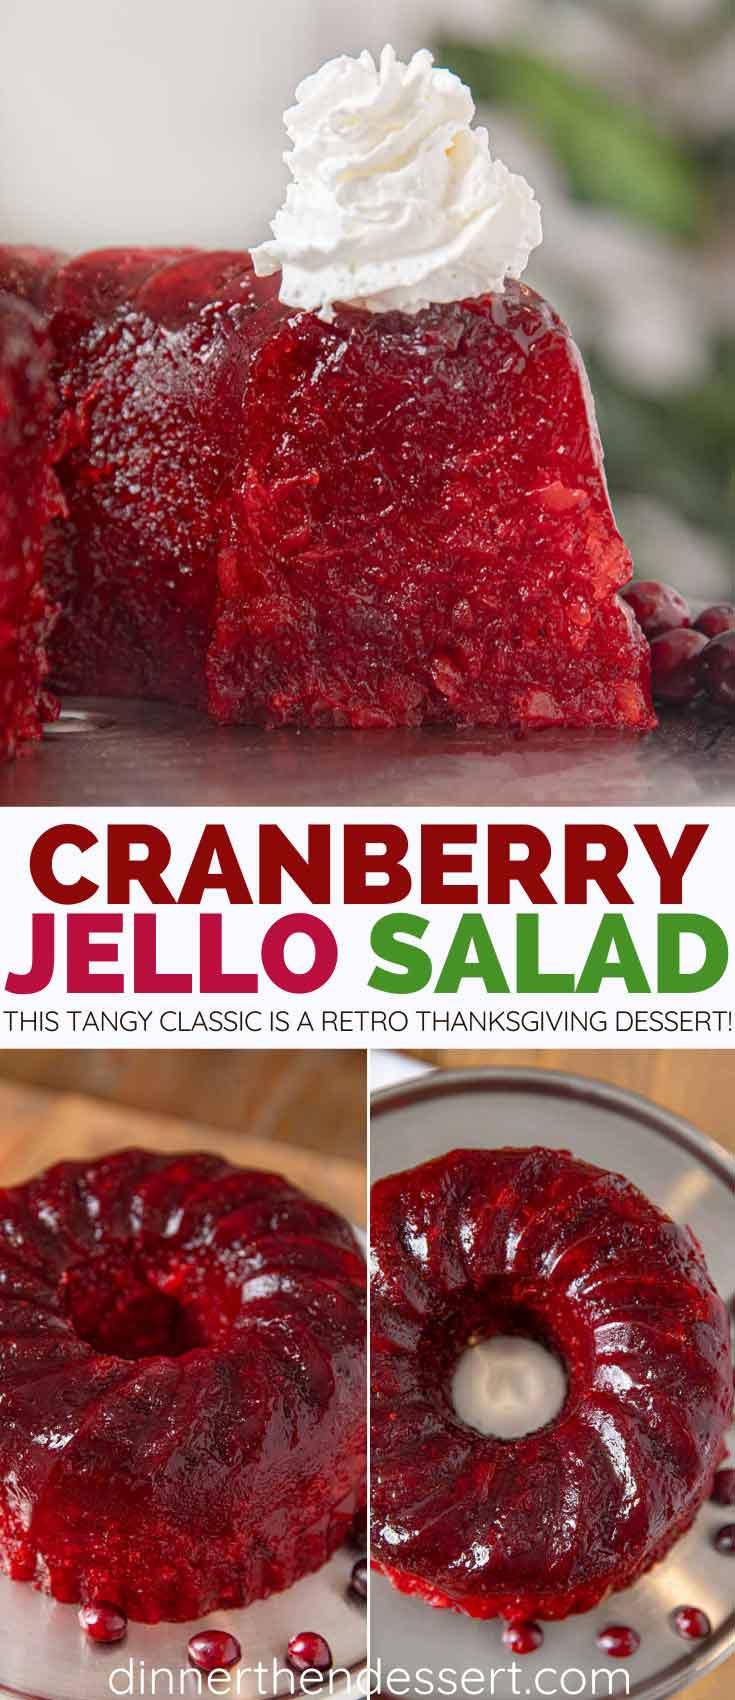 Cranberry jello salad collage